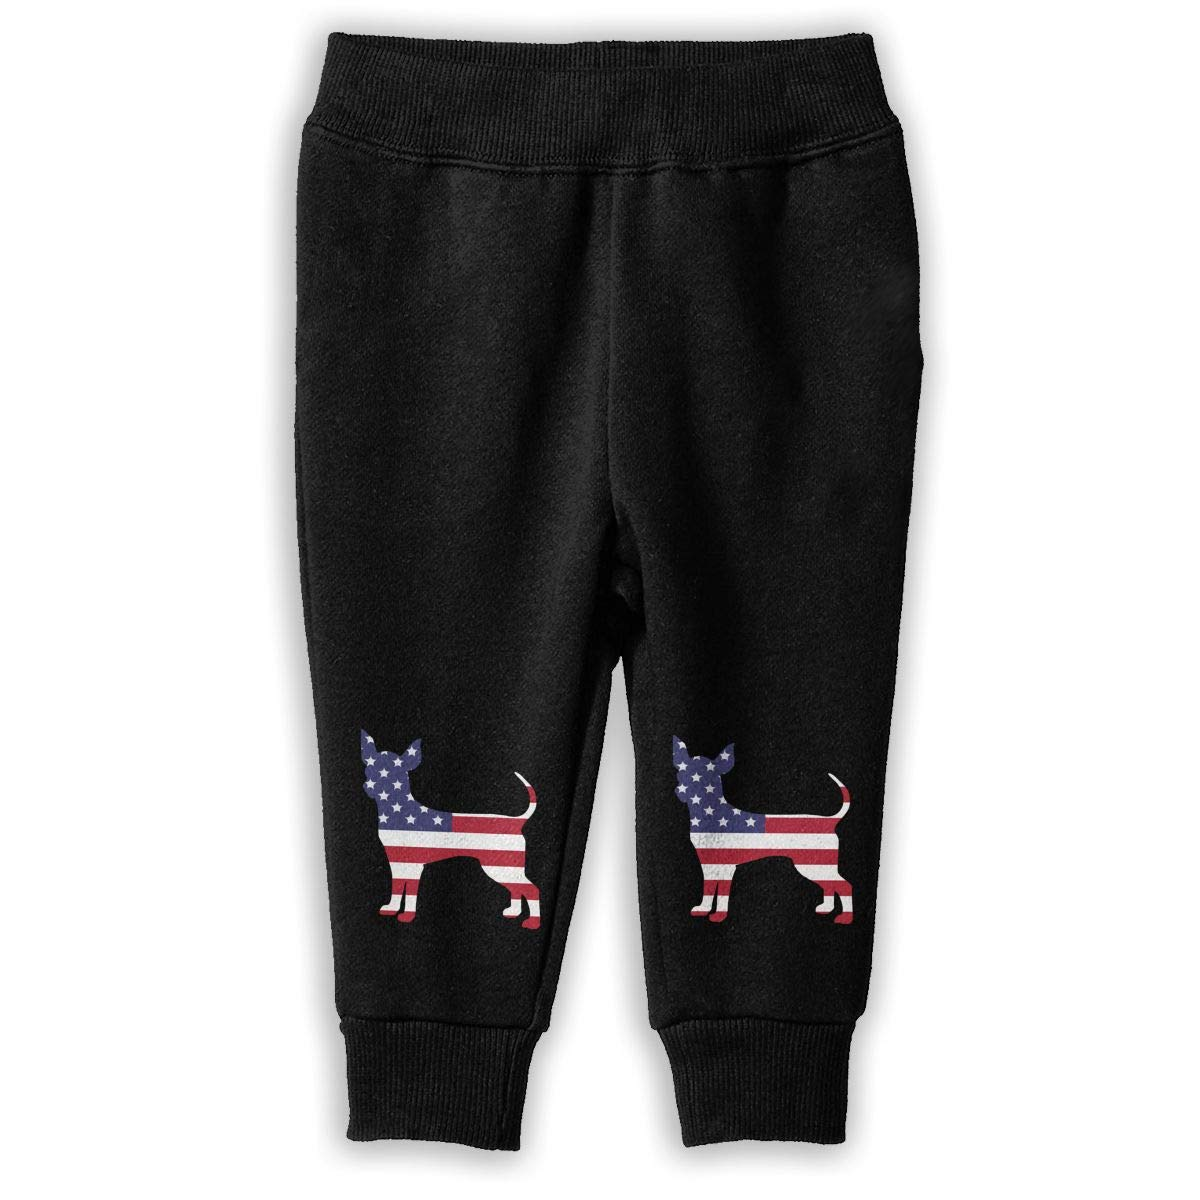 Childrens Fleece Pants NJKM5MJ American Flag Dog Sweatpants